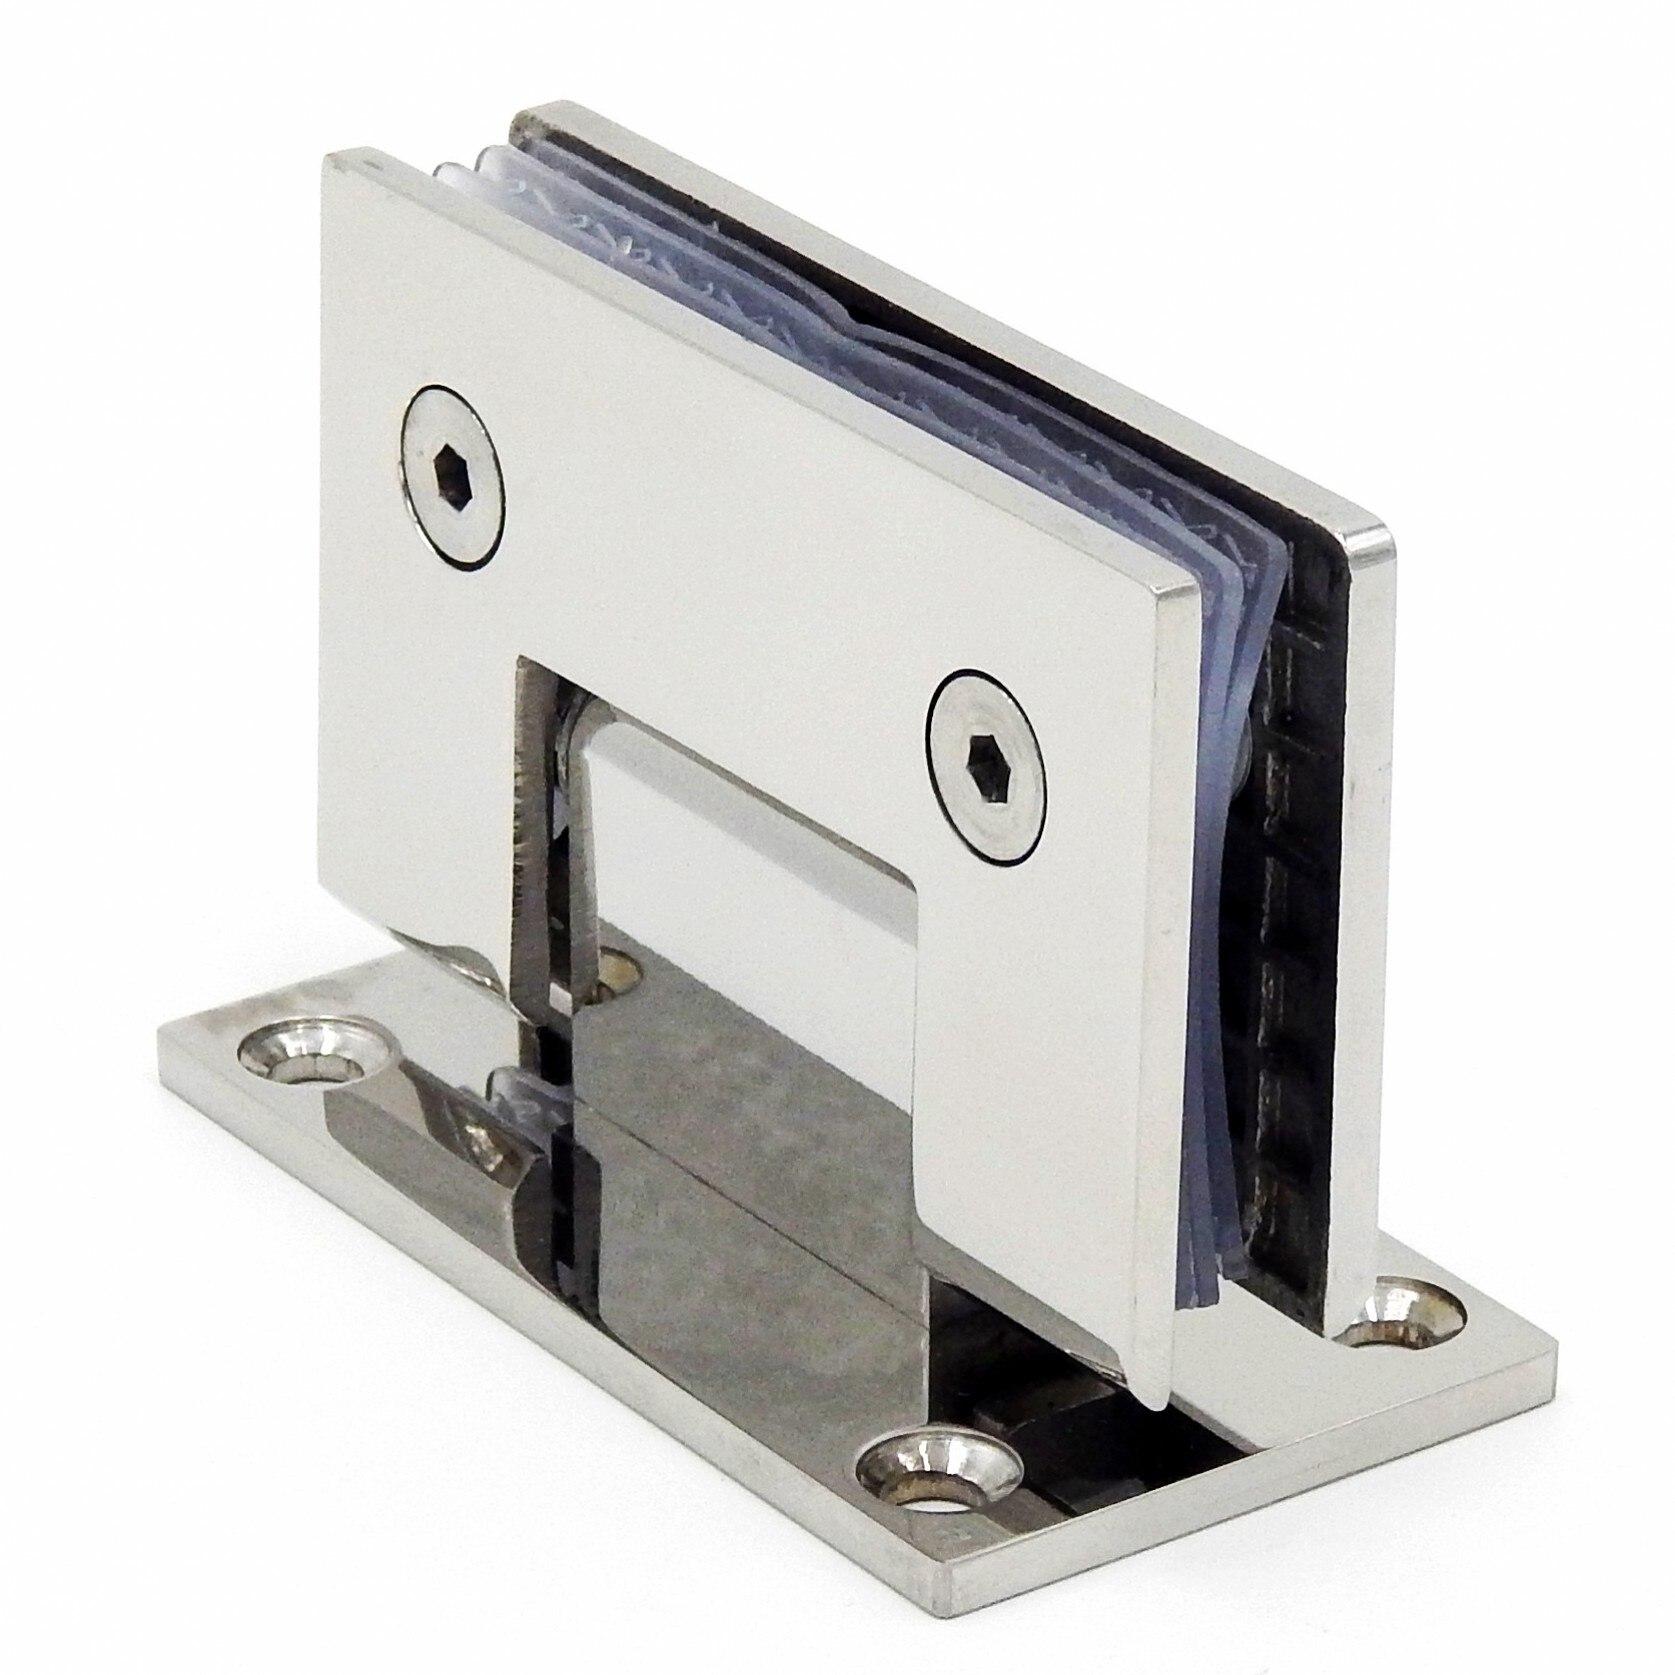 Stainless Steel Frameless Glass Door Hinge 90 Degrees Of Bathroom Clamp Mirror Light Bathroom Folding Glass Clip Package Mail